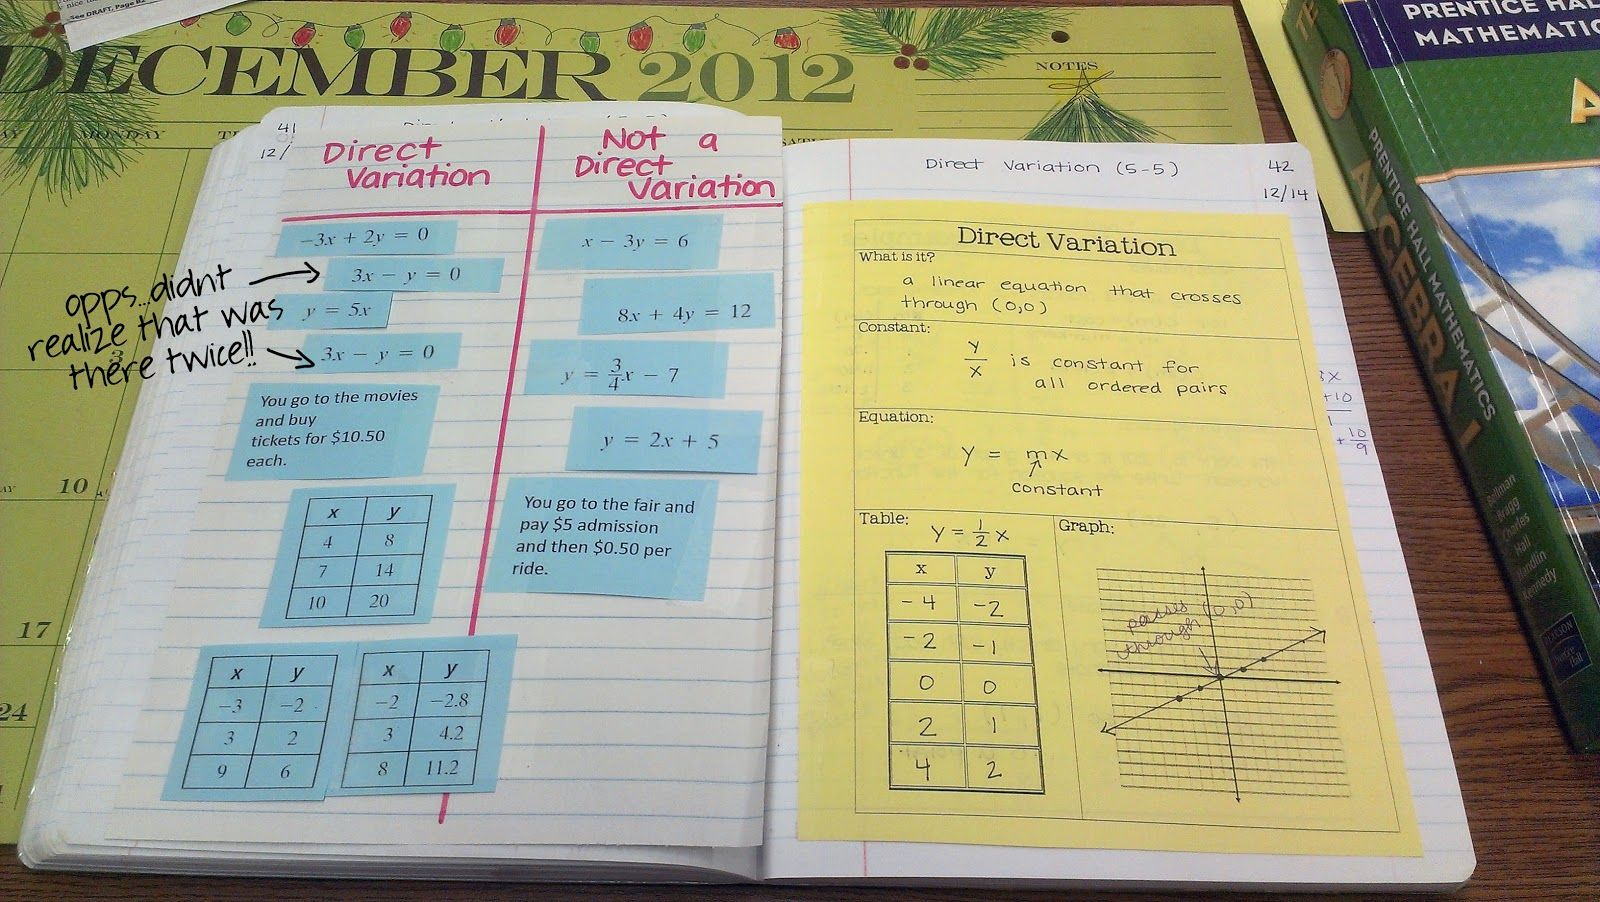 small resolution of 8 Direct Variation ideas   direct variation